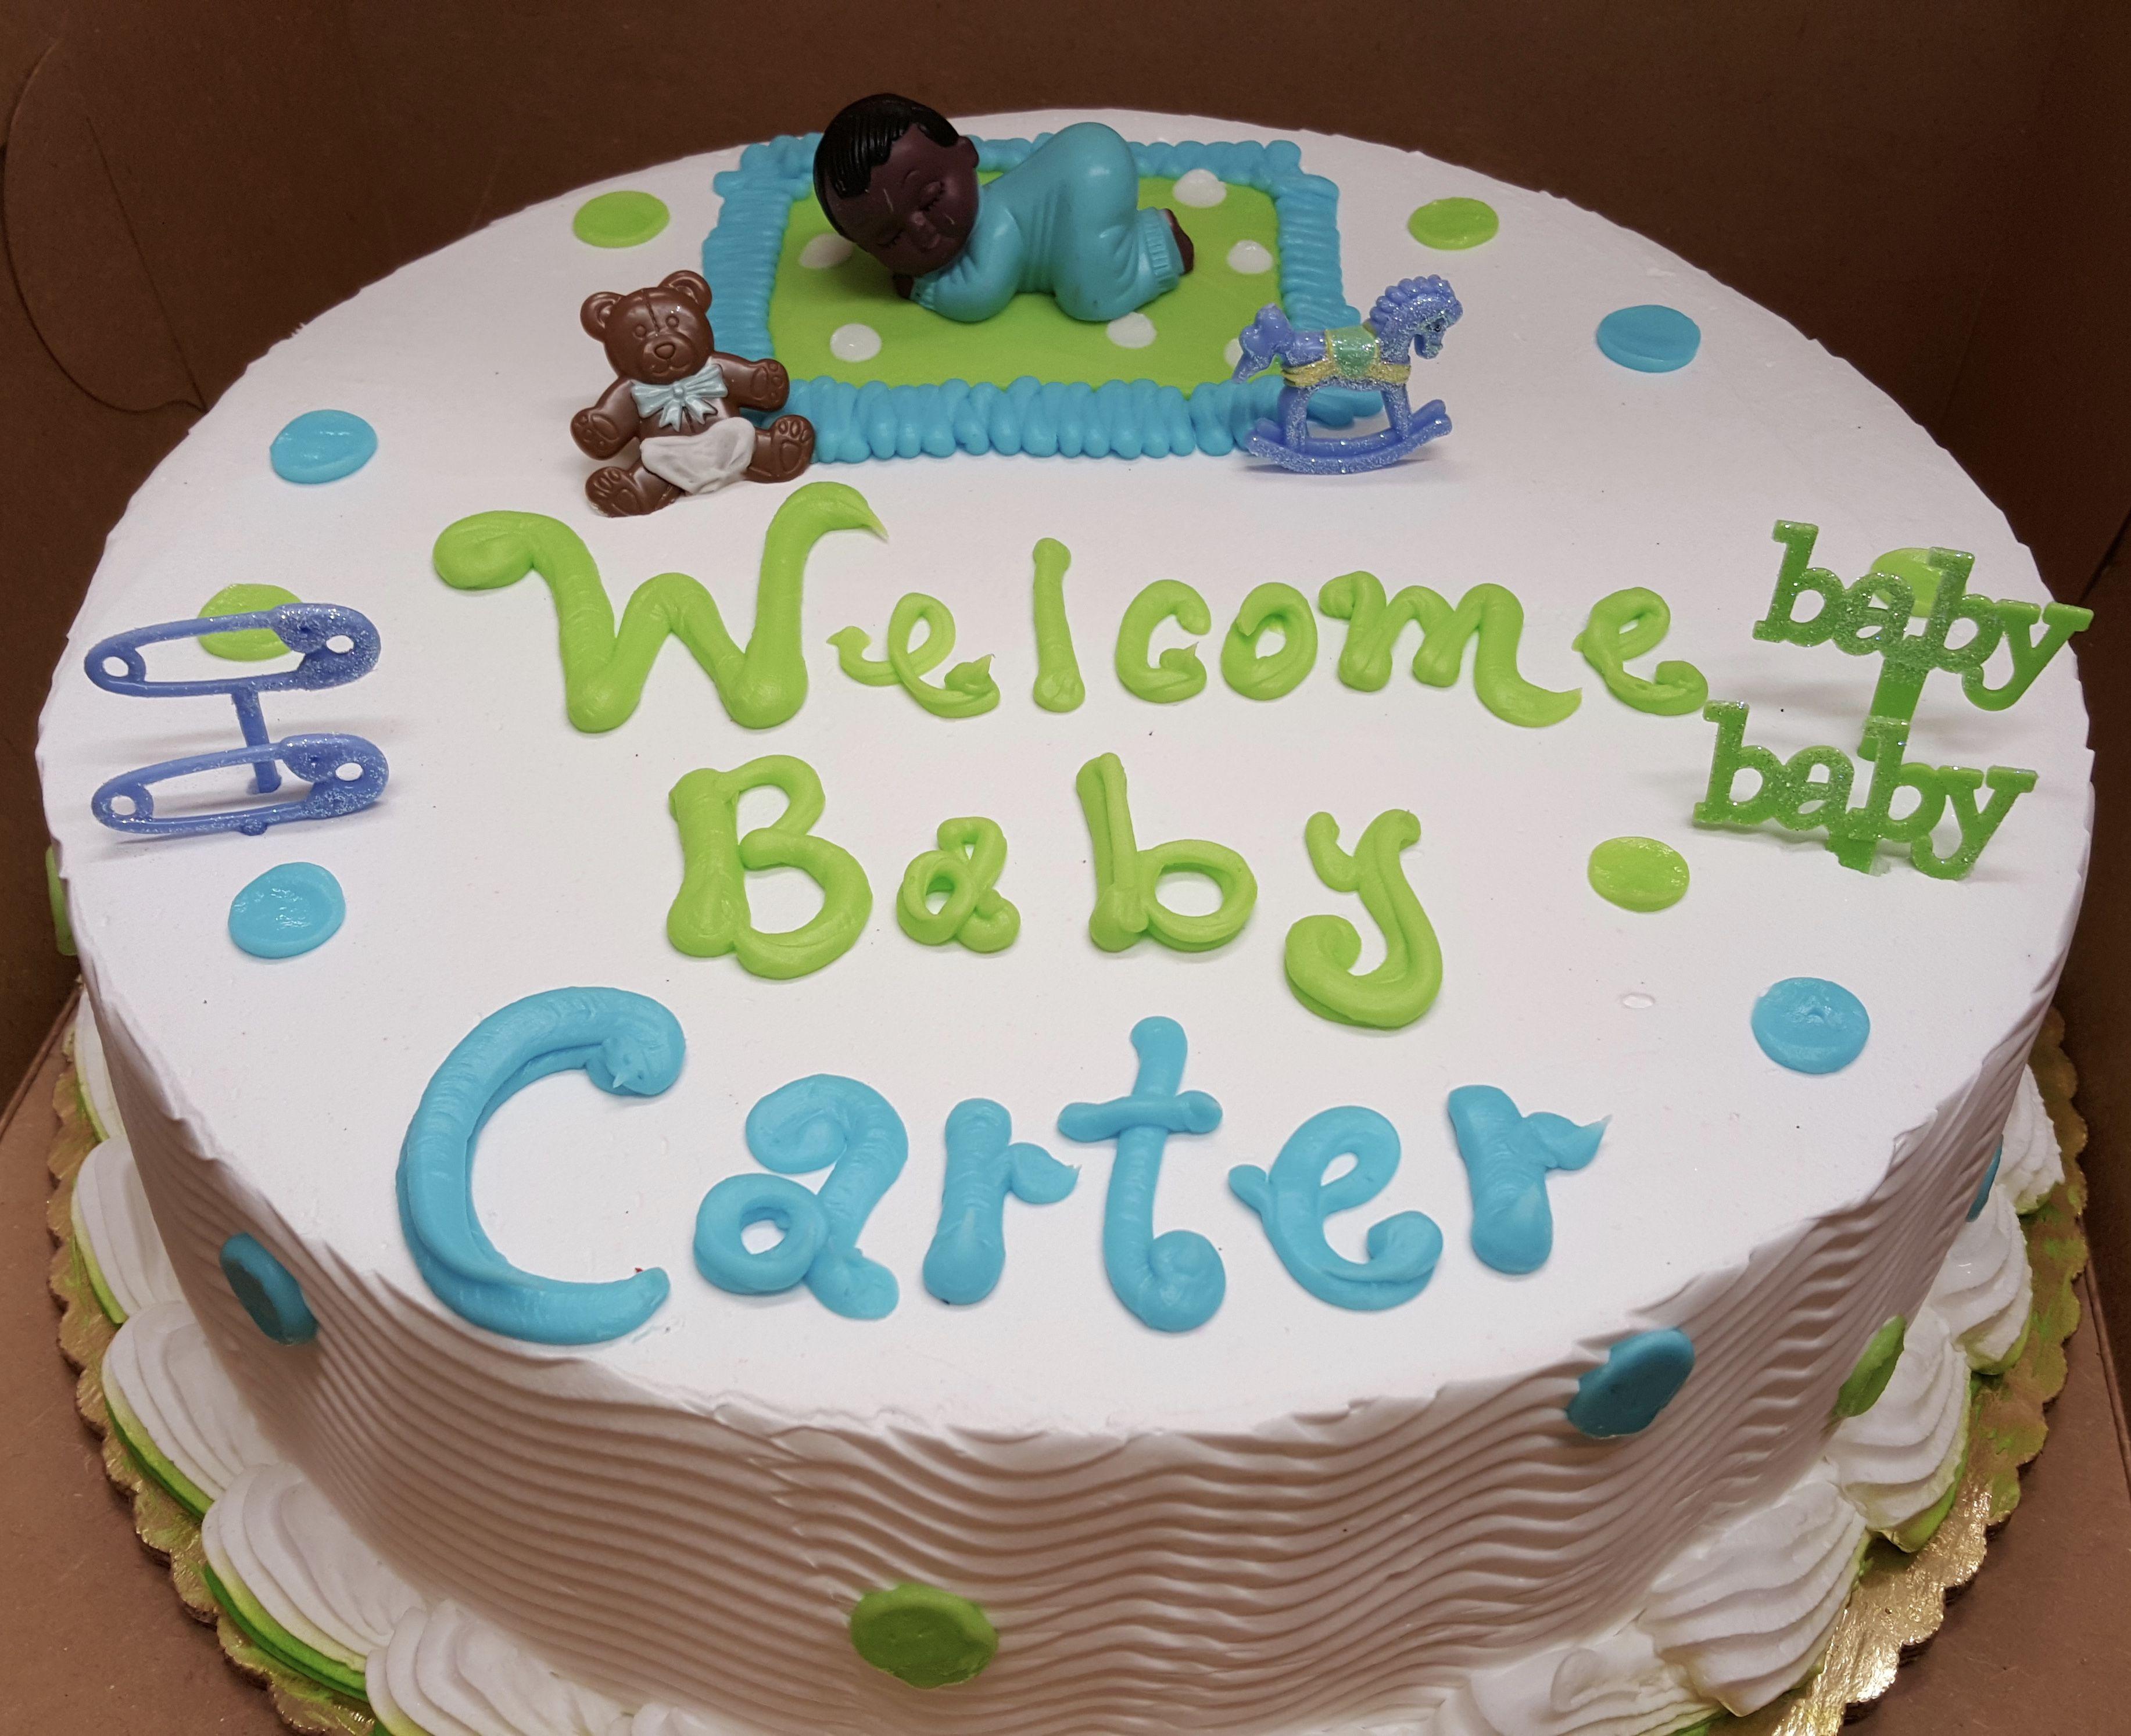 Calumet Bakery Baby Shower Cake